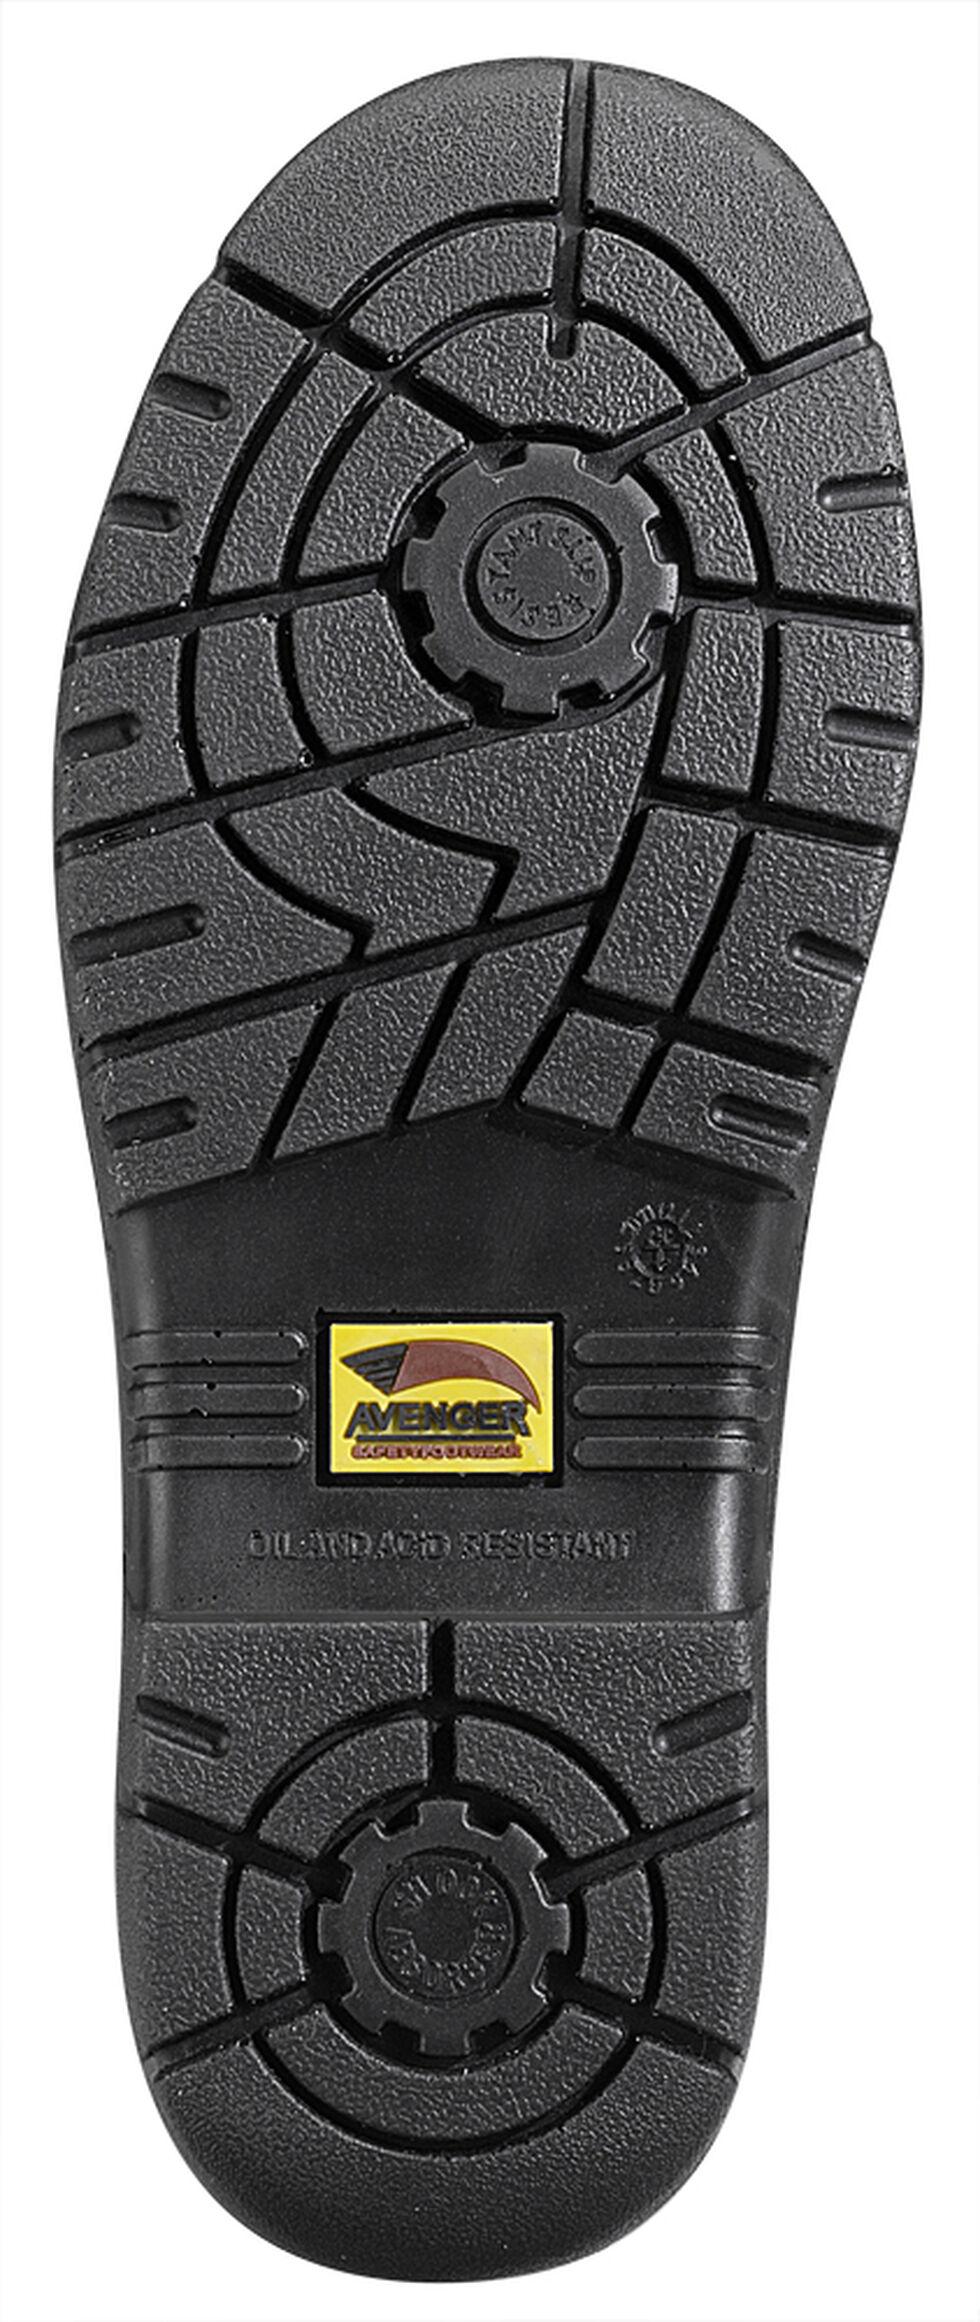 Avenger Men's Brown Pebbled Leather Anti-Slip Work Boots - Steel Toe, Brown, hi-res